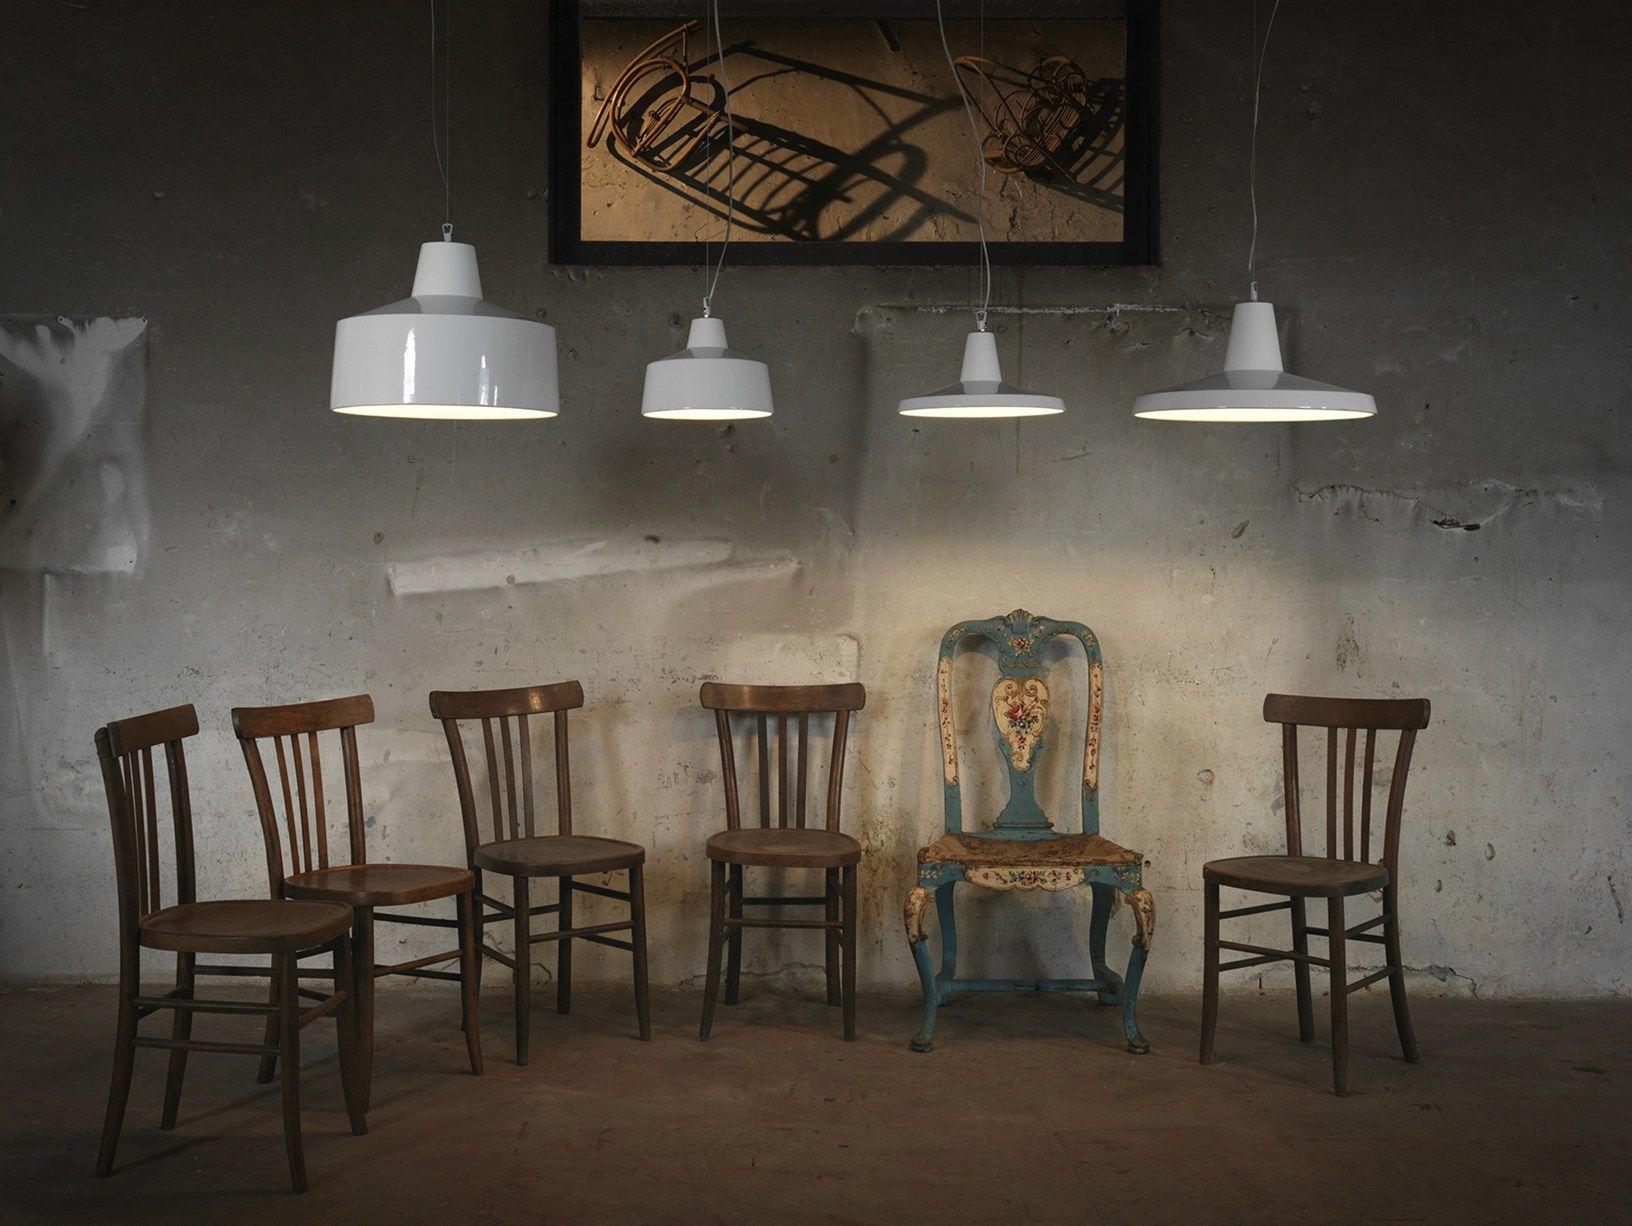 Lampada Vintage Industriale : Design lineare per le lampade gangster di karman